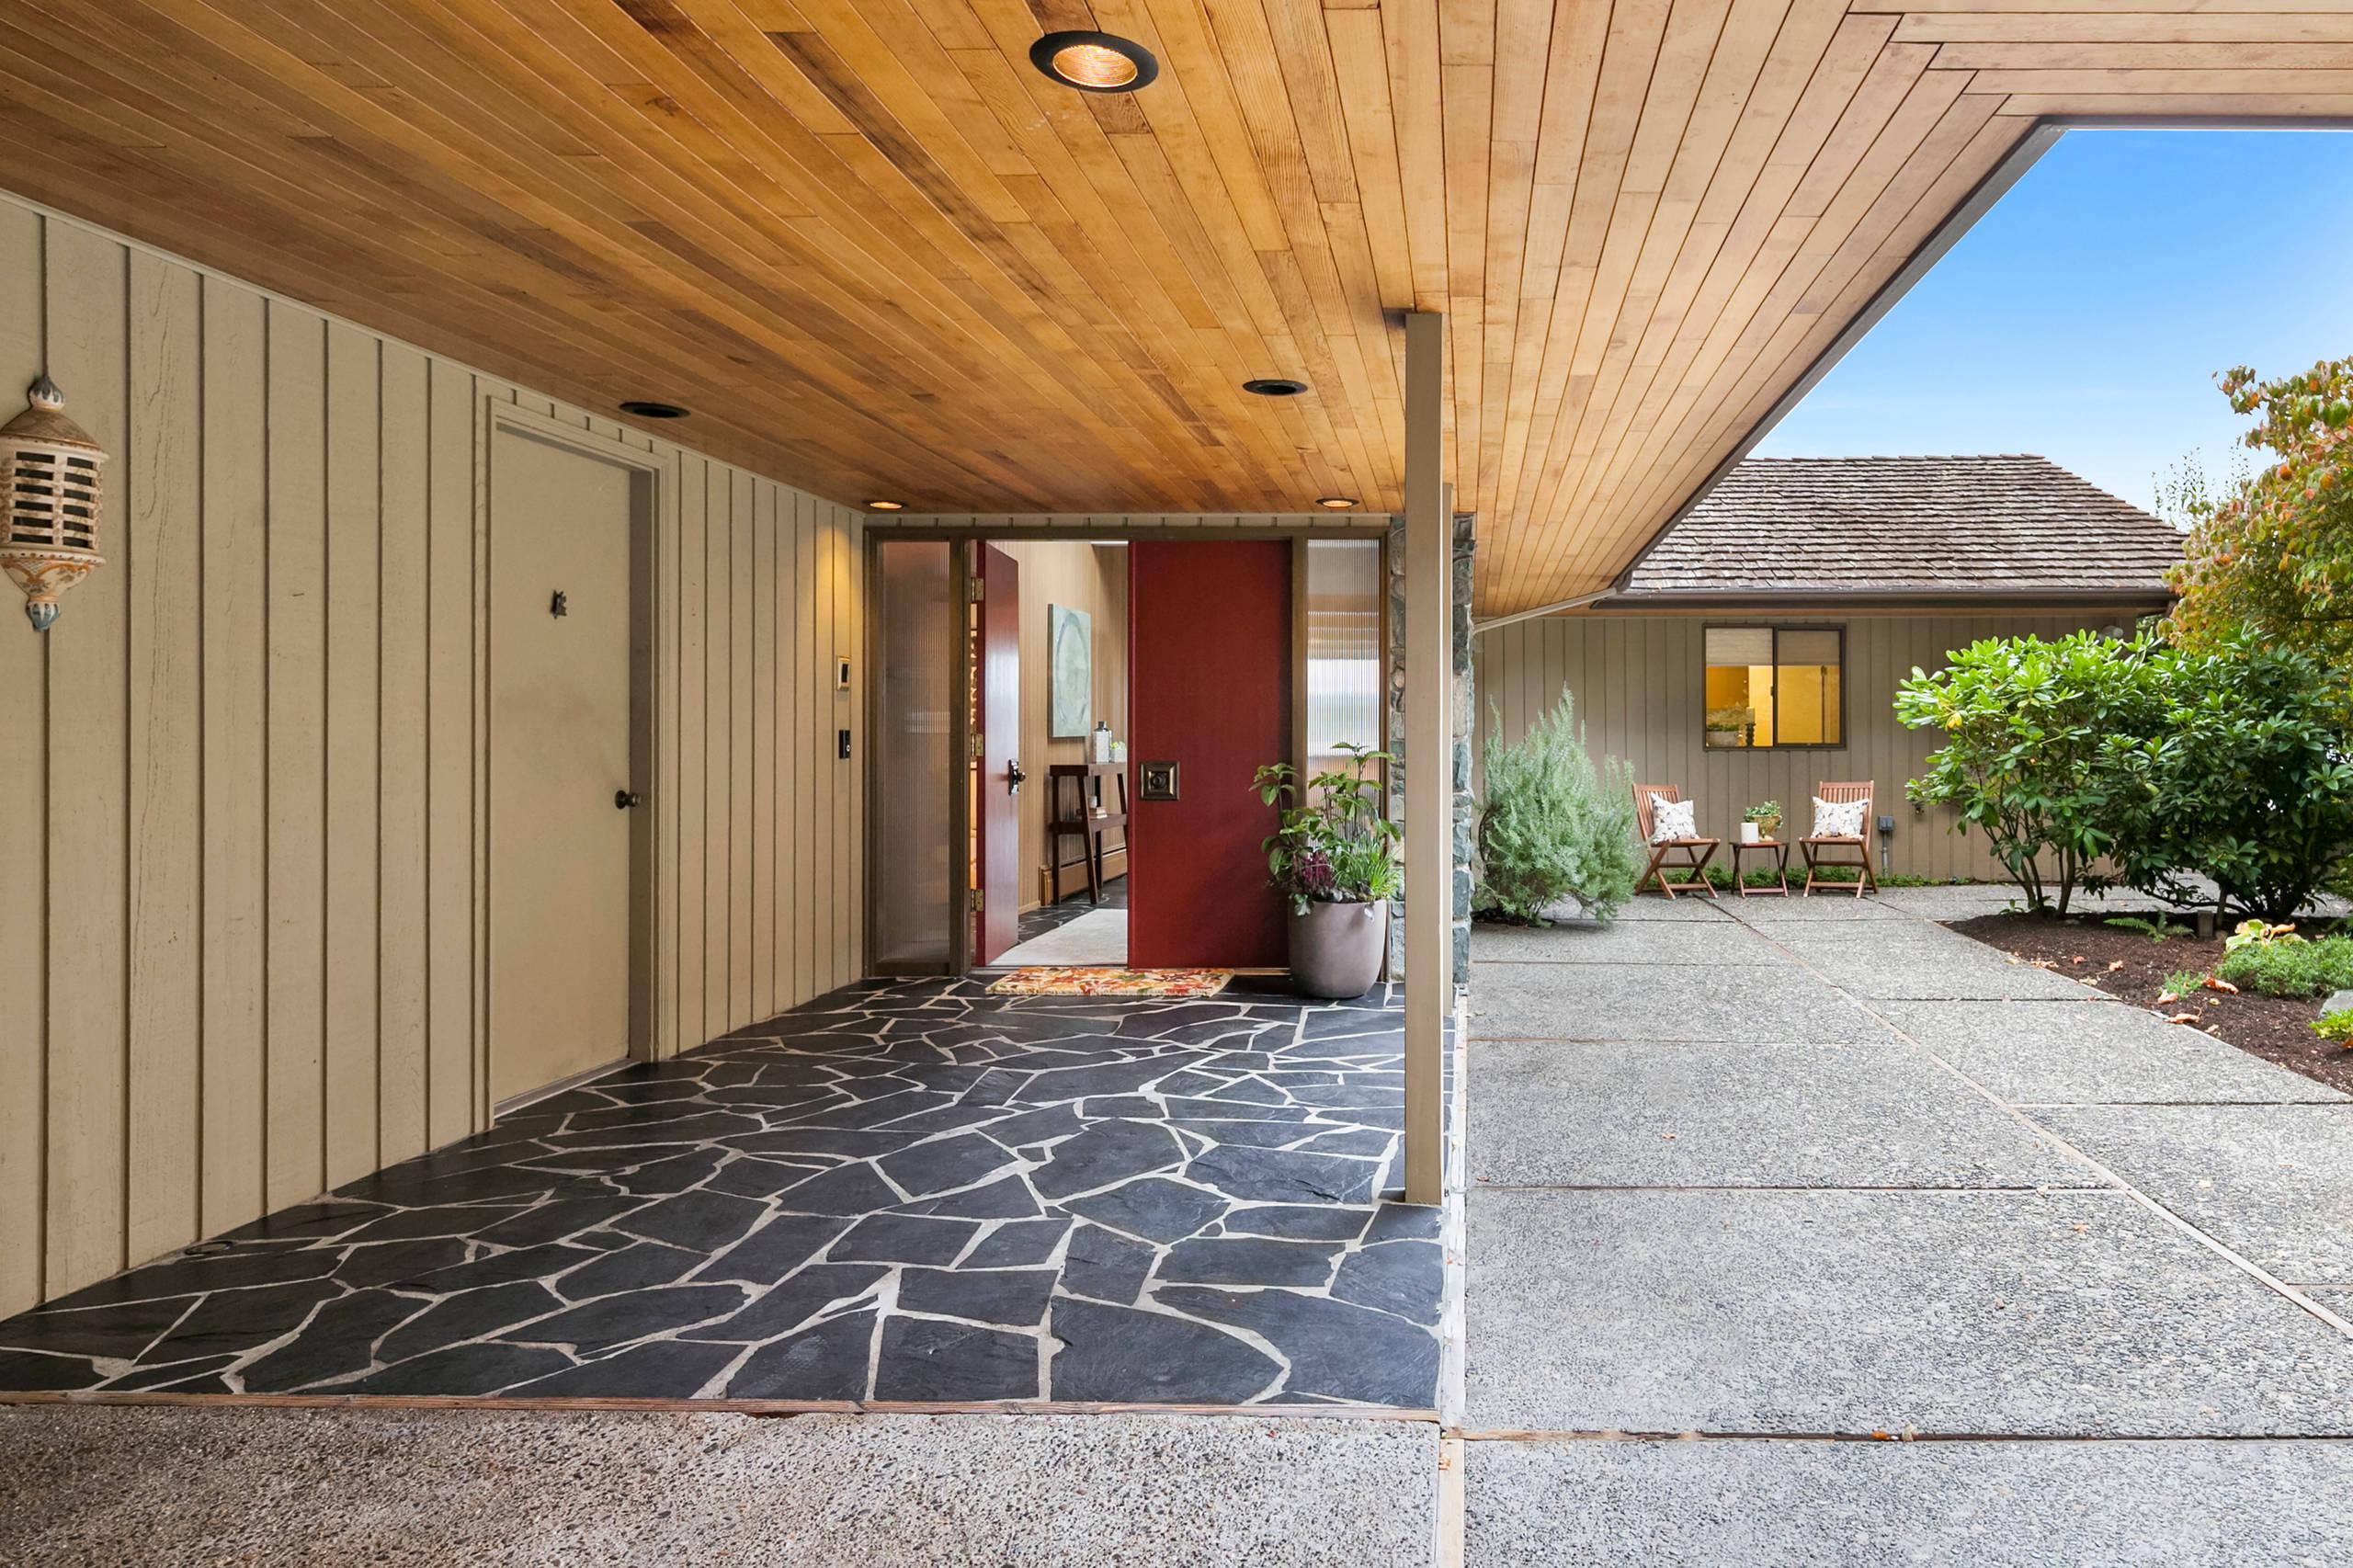 16 Wonderful Mid Century Modern Entrance Designs